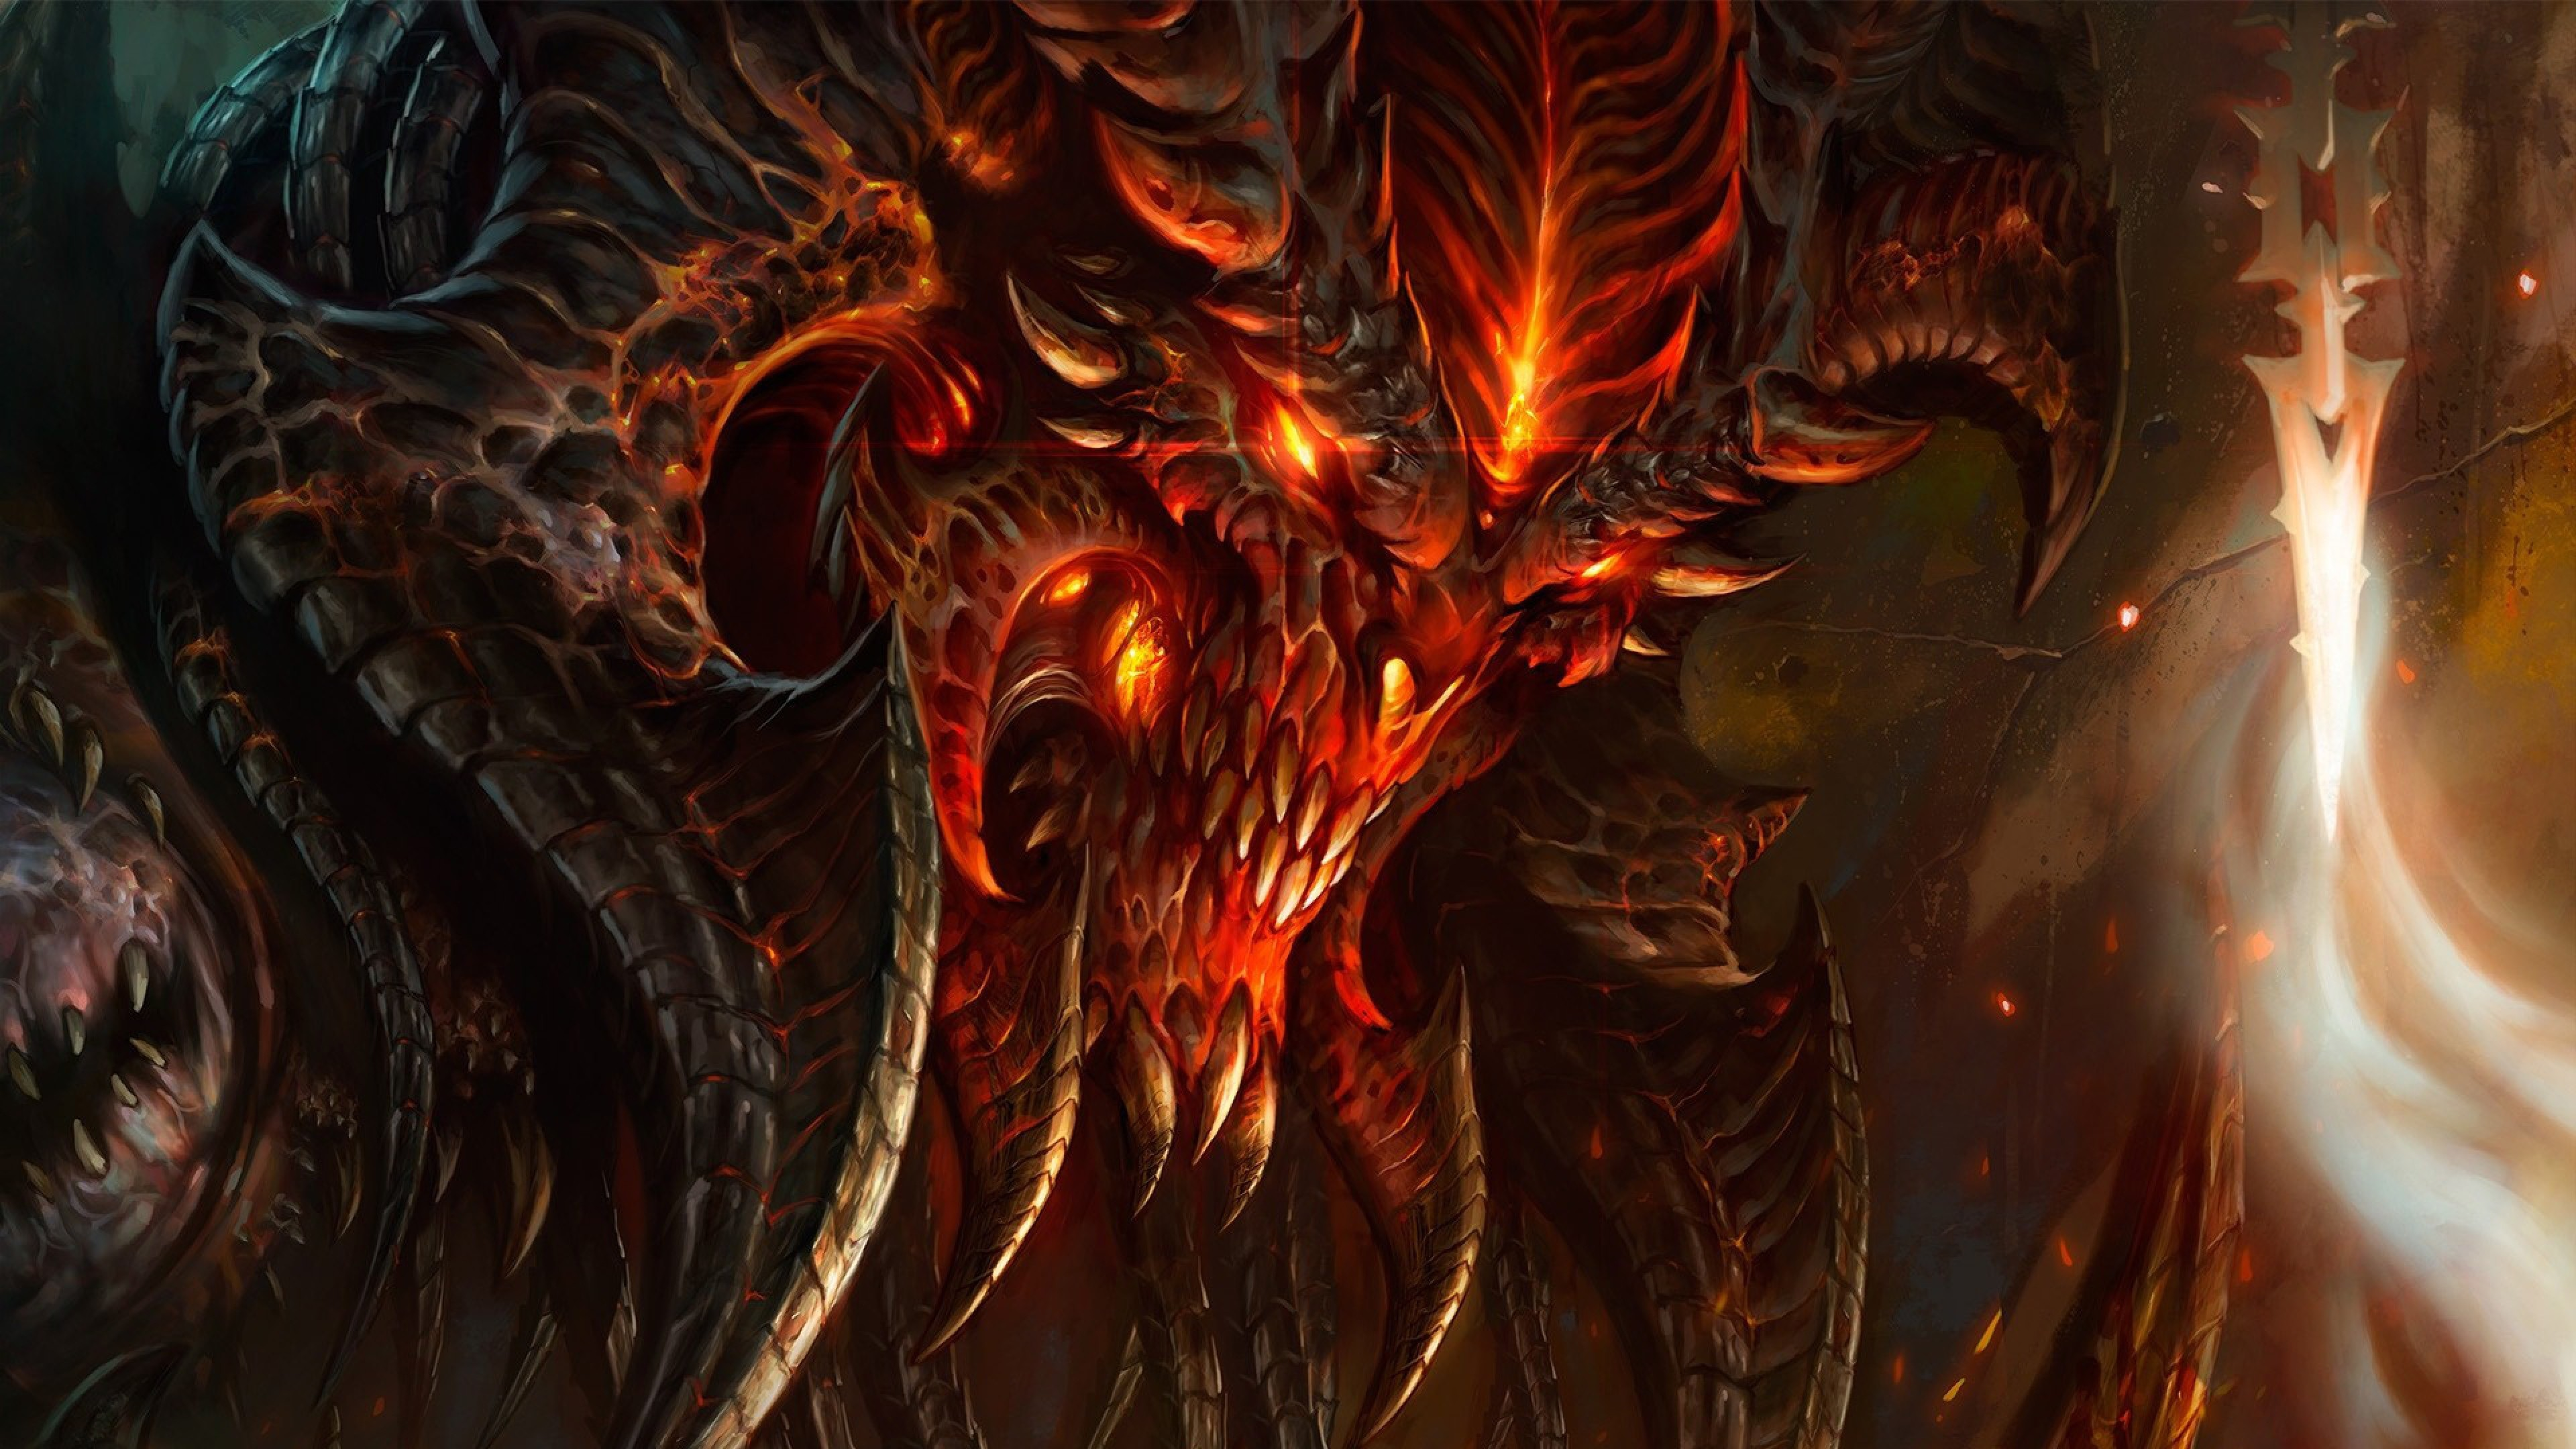 Preview wallpaper diablo 3, diablo, character, fire, monster, light, face